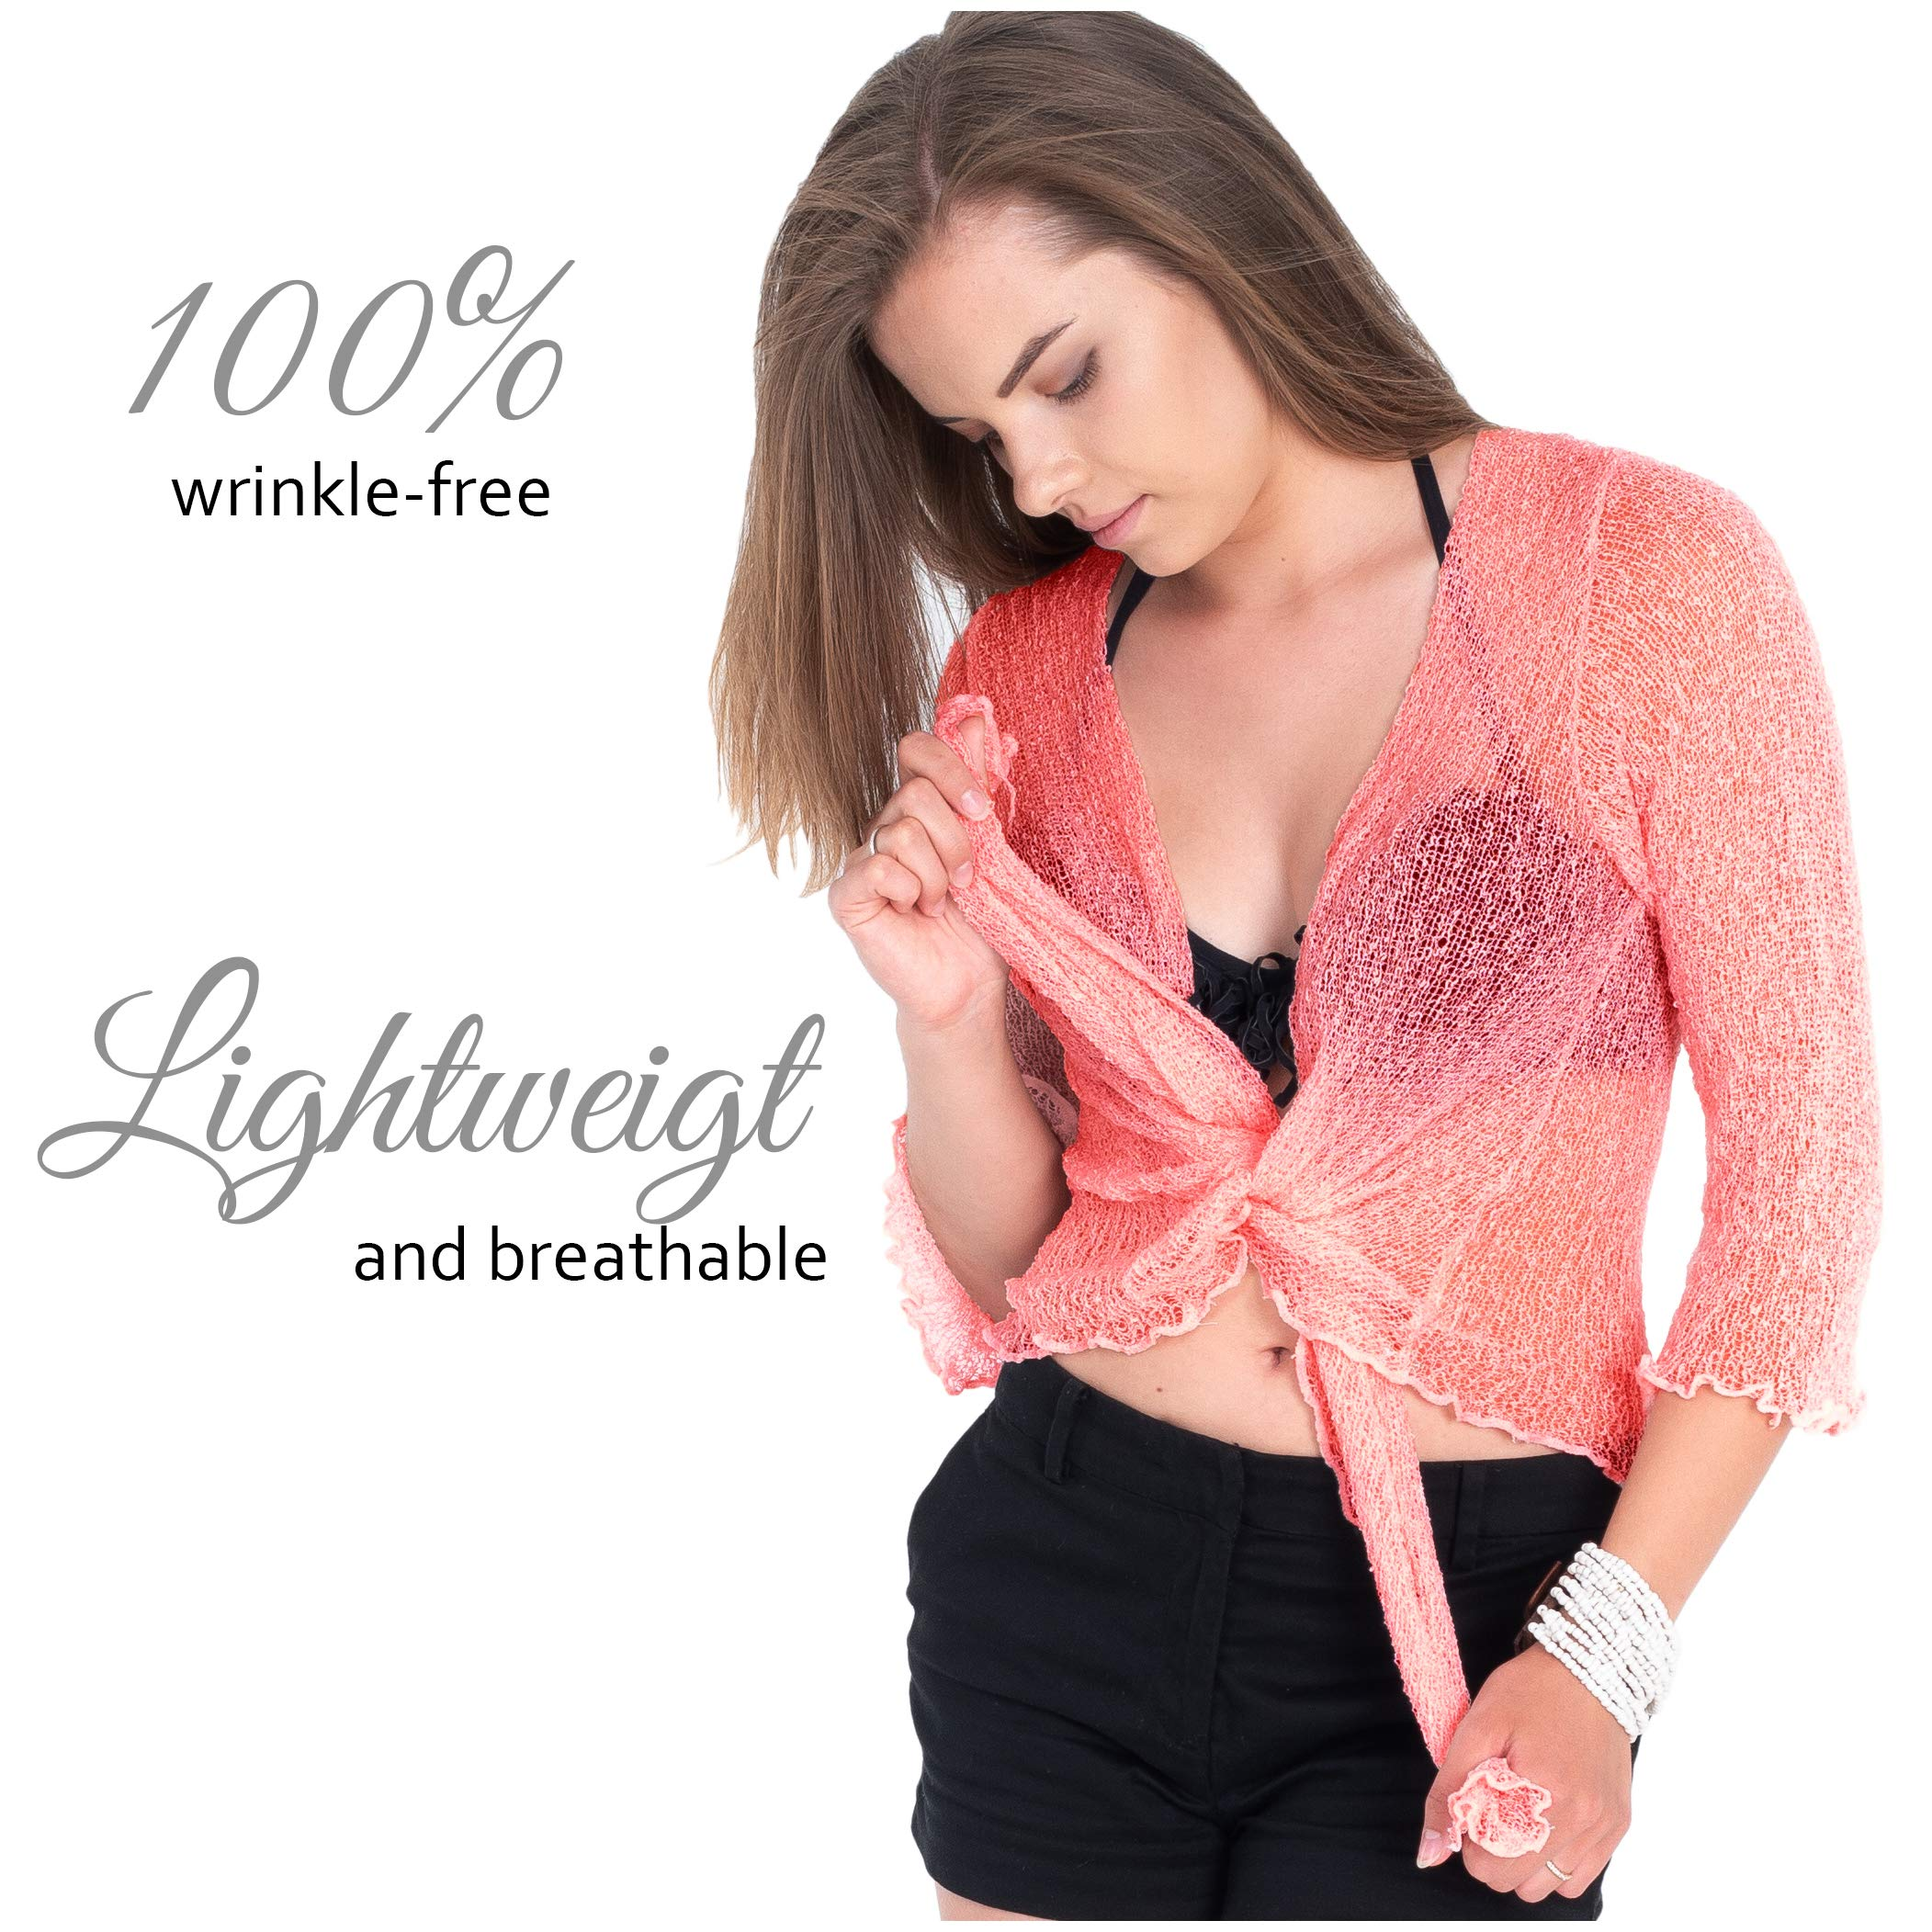 Boho Village Lightweight Cardigans for Women - 3/4 Sleeve Shrugs for Dresses. Dark Pink/Salmon Pink Size S-XL by Boho Village (Image #3)